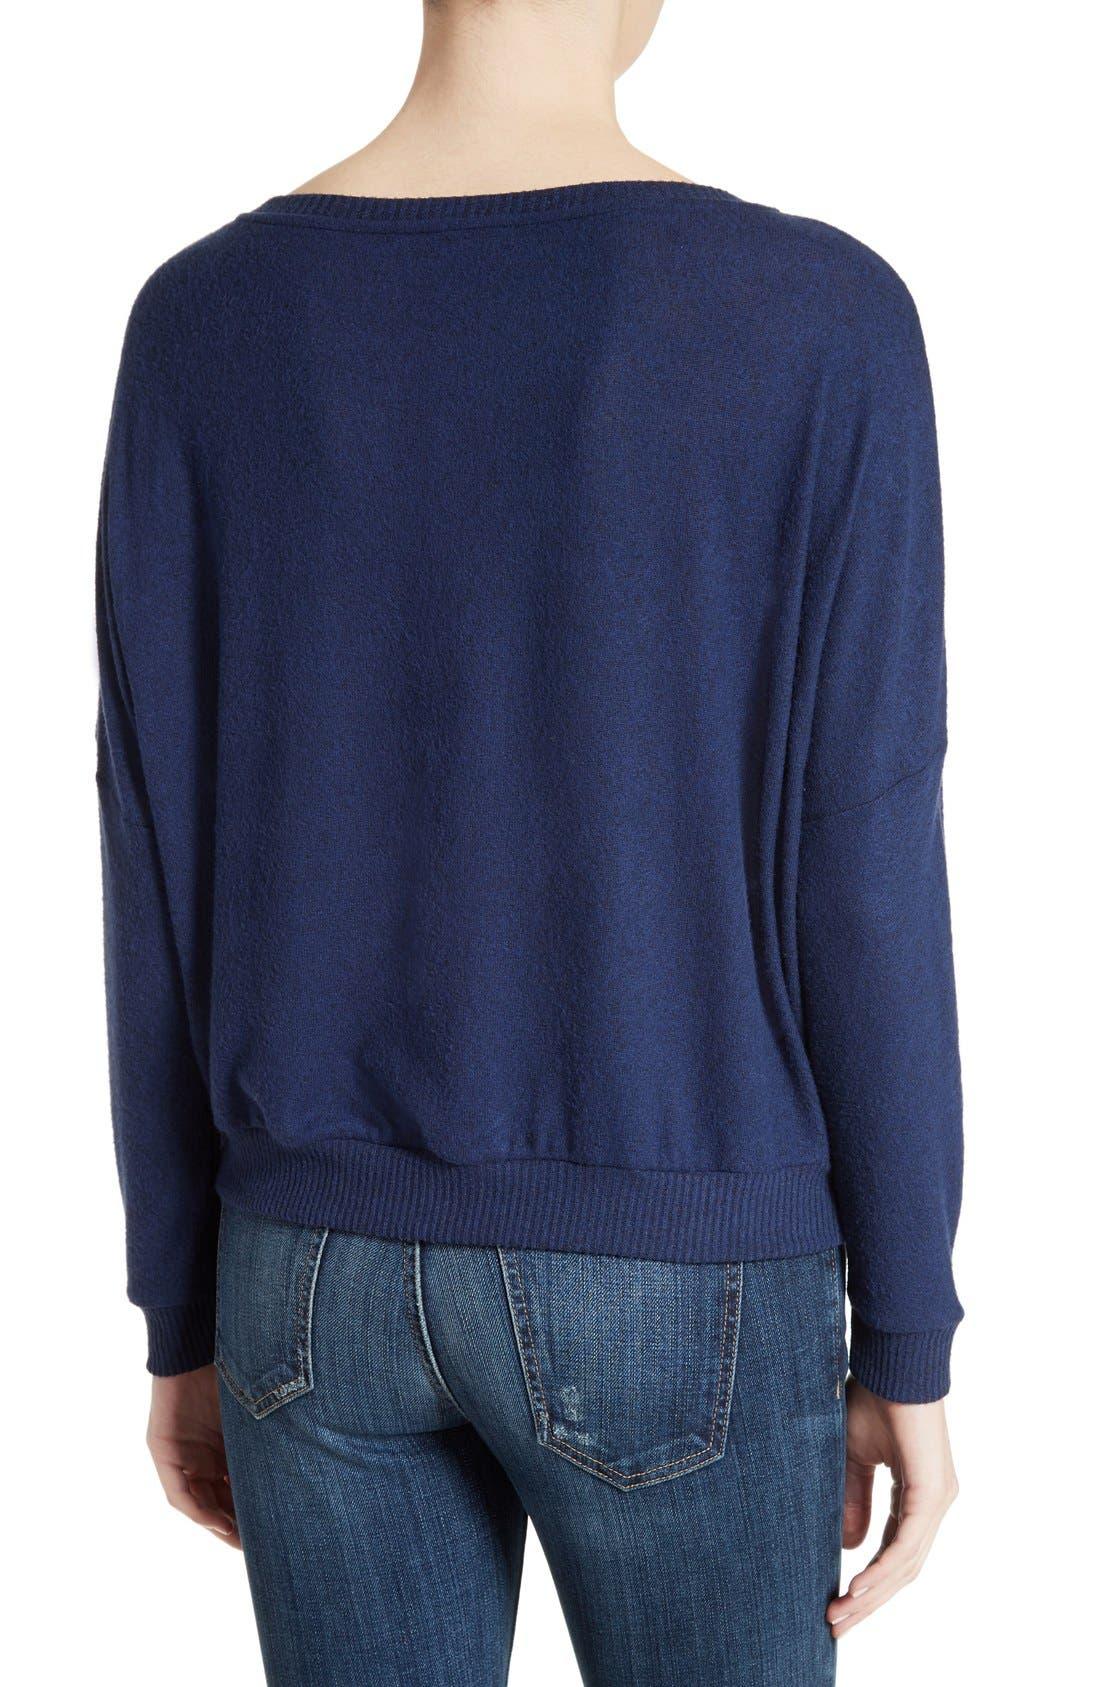 Soft Joie Giardia Drop Shoulder Sweater,                             Alternate thumbnail 2, color,                             Peacoat